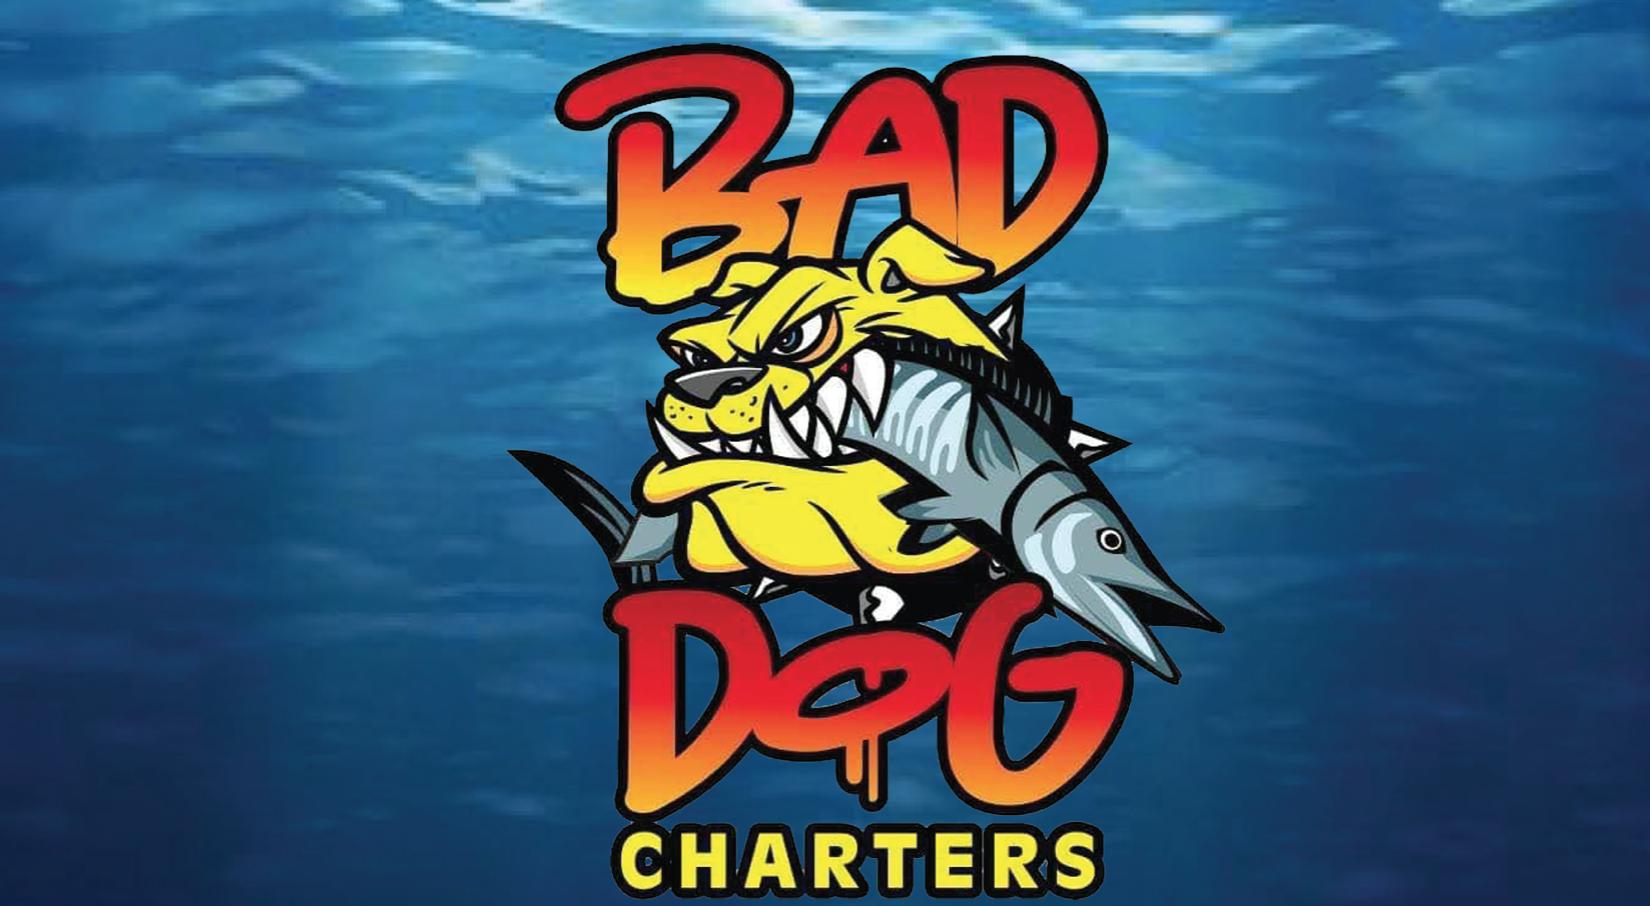 Bad Dog Charters